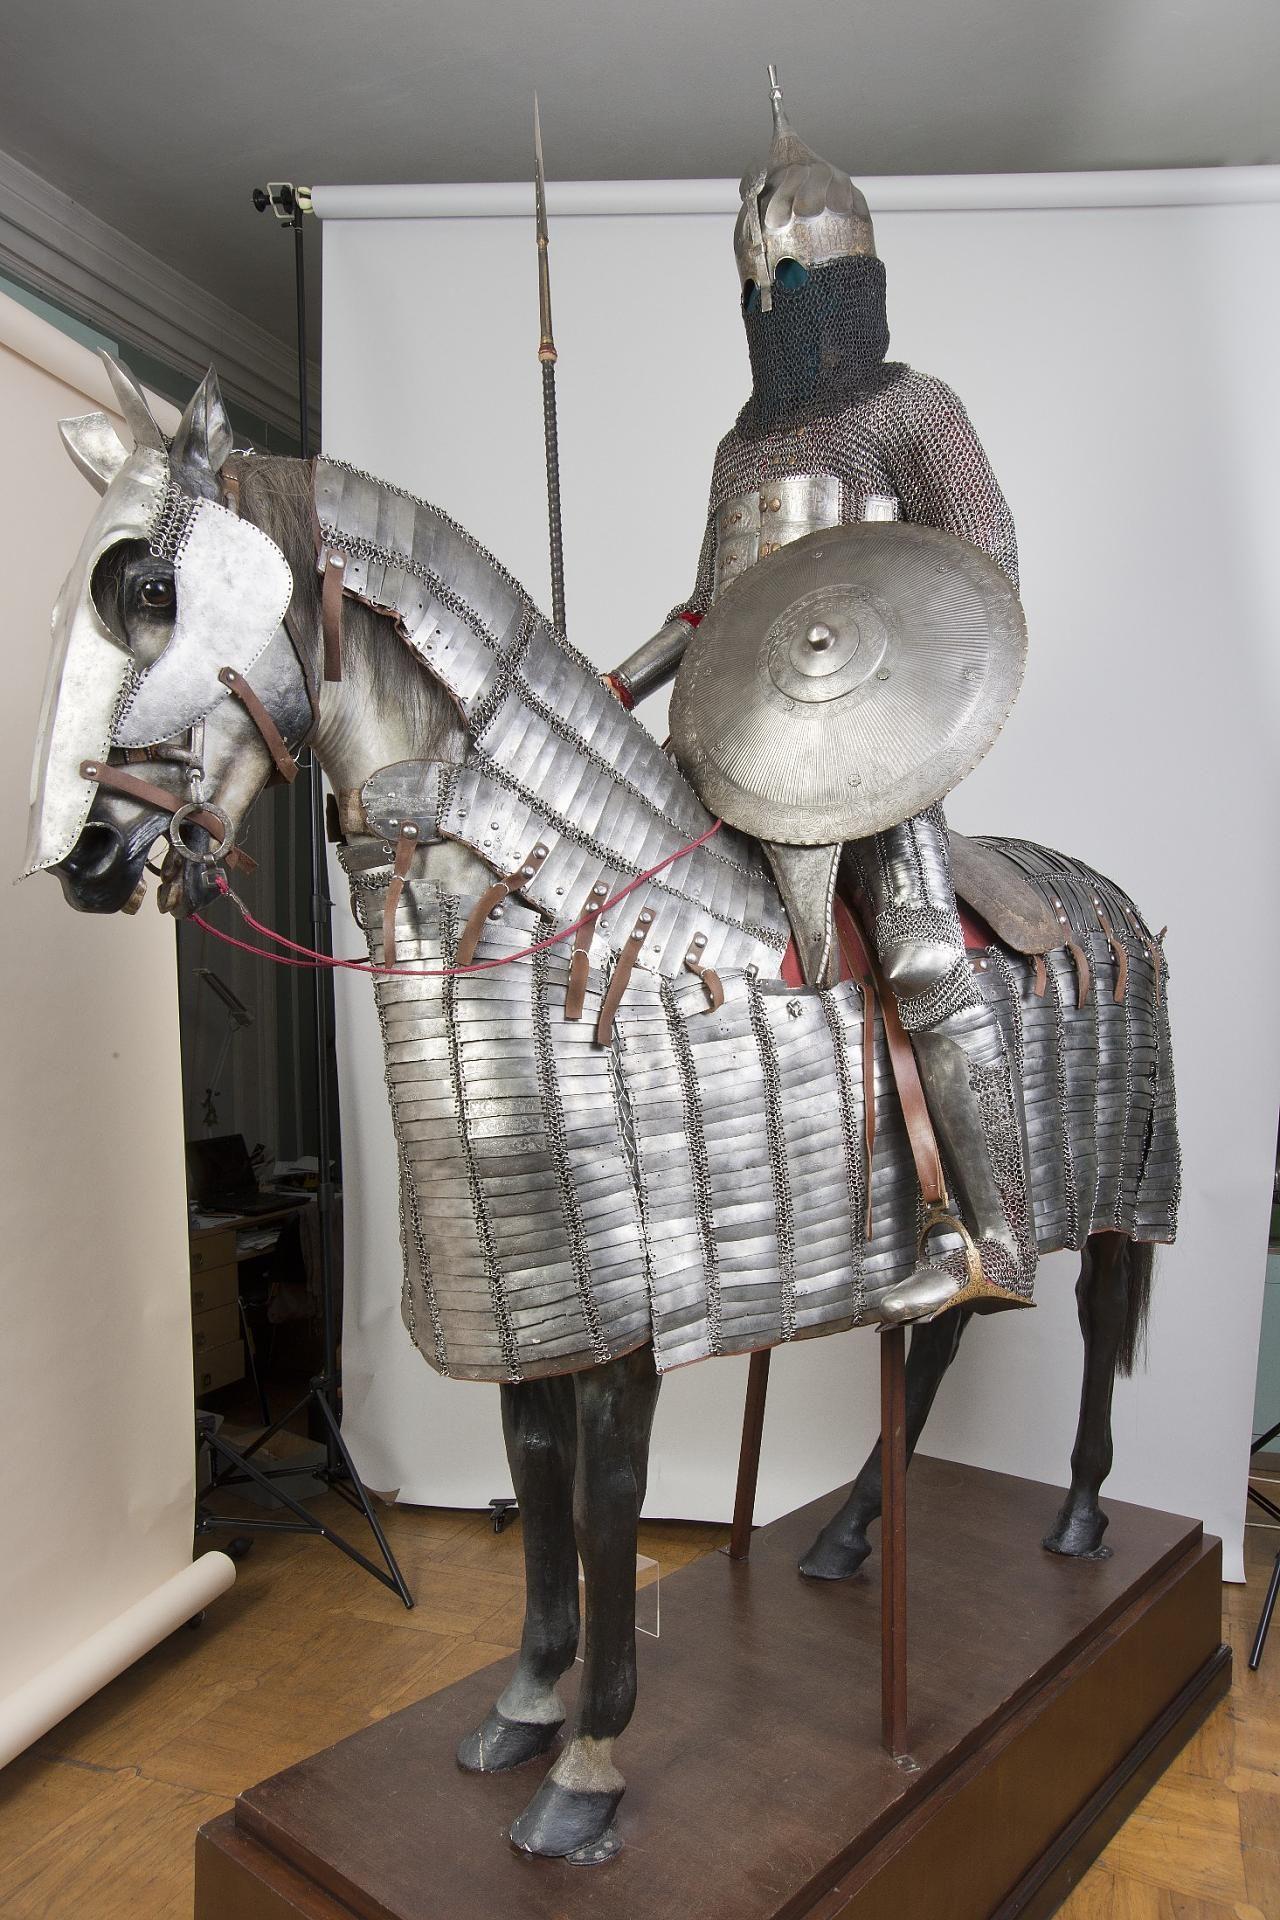 b7272ee40b5e51246584e2764db25557--medieval-horse-medieval-armor.jpg ...